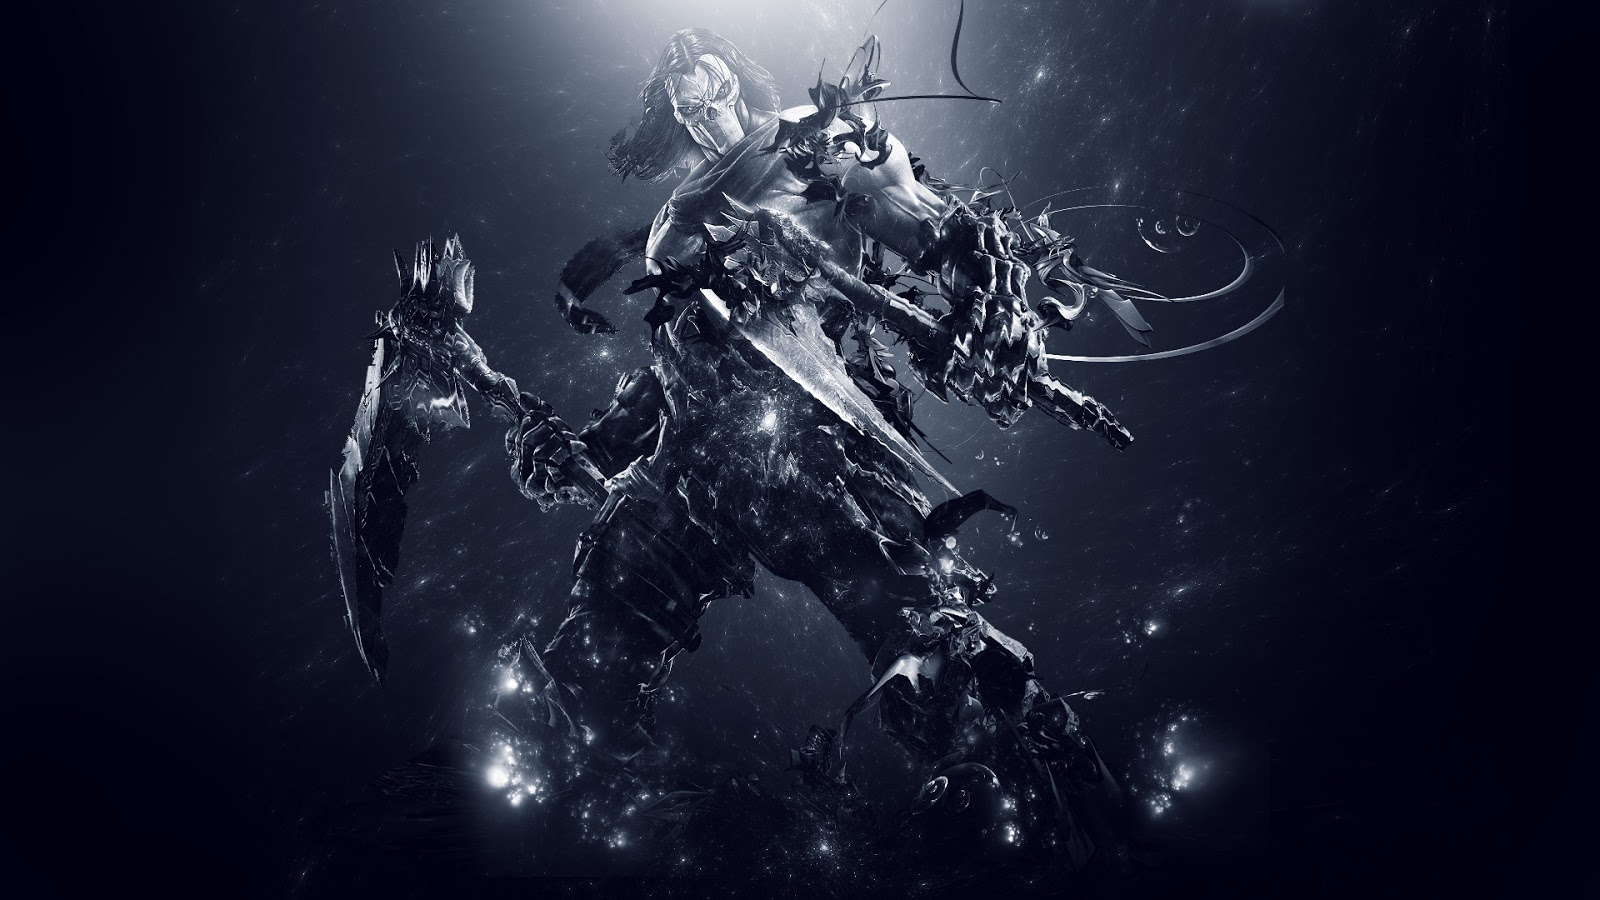 Darksiders 2 Video Game Wallpaper E Fotos Em HD